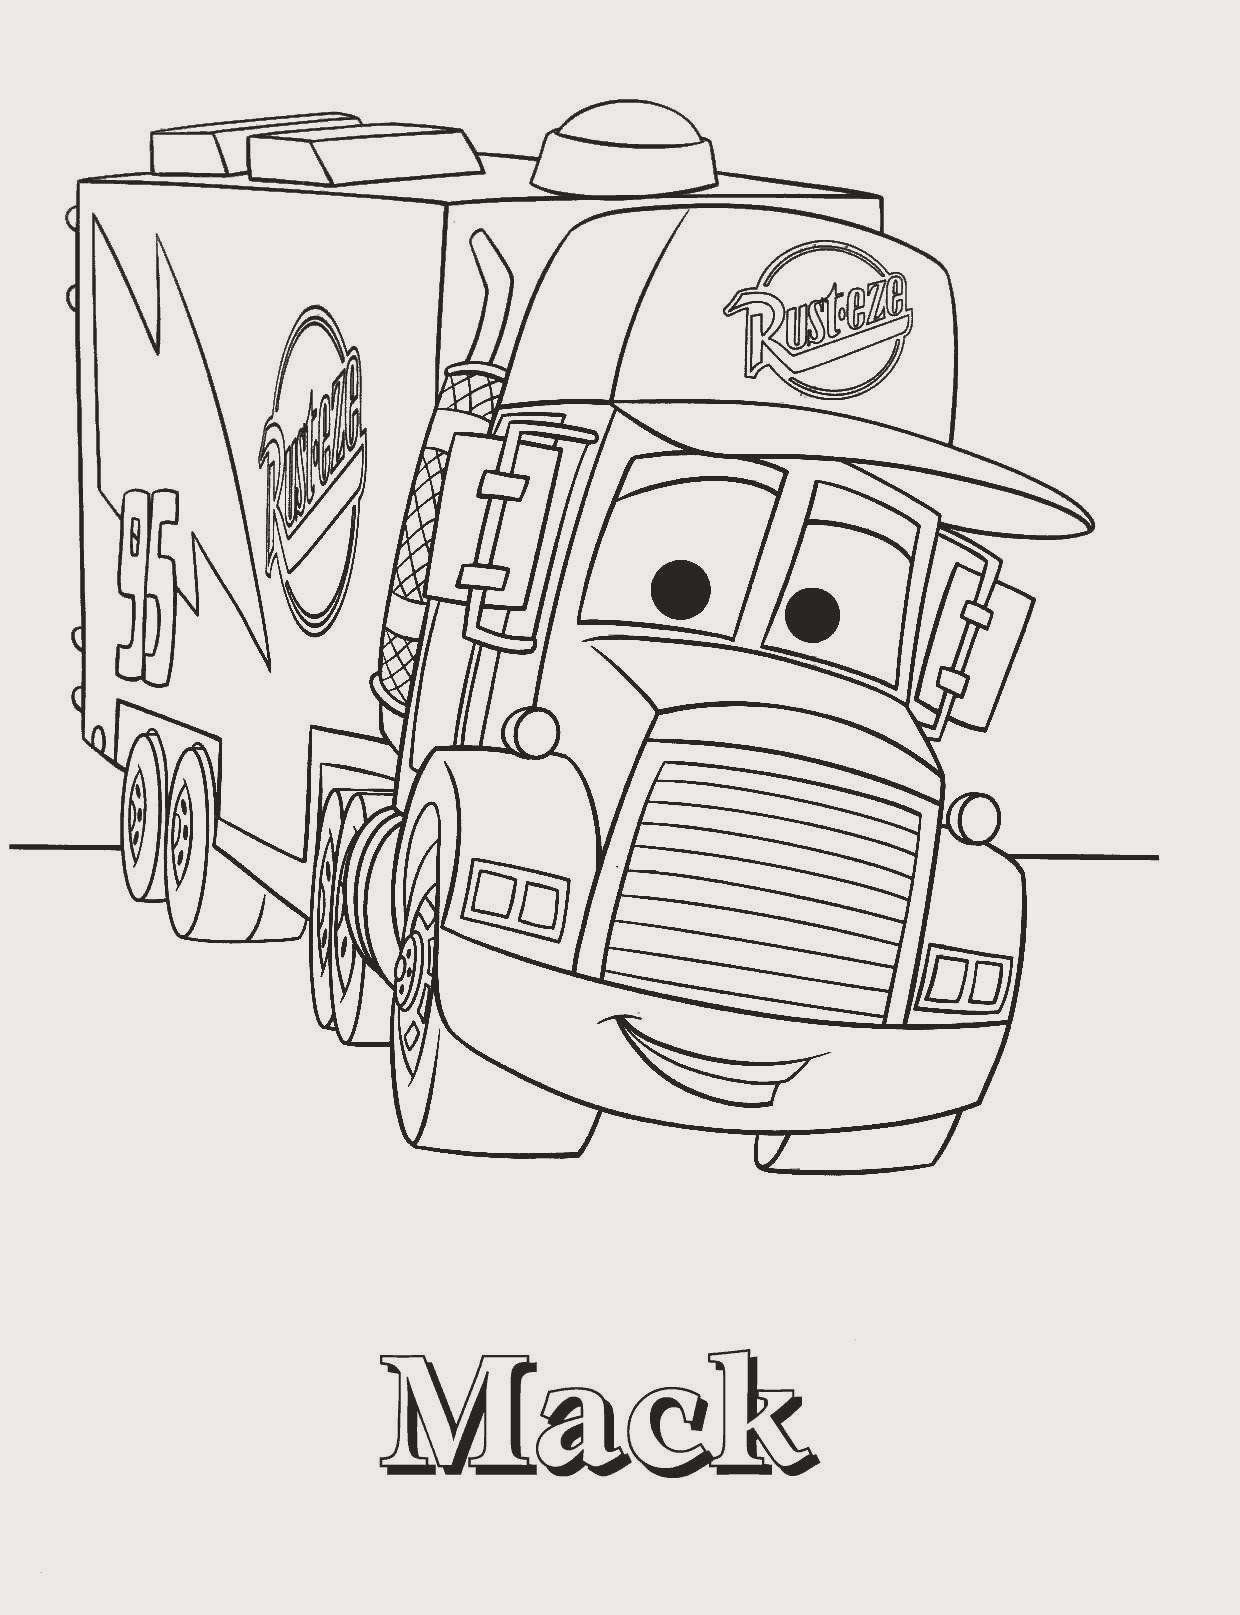 Disney Pixar Cars Coloring Pages Fresh 73 Lightning Mcqueen And Mater Coloring Pages In 2020 Cars Coloring Pages Disney Coloring Pages Truck Coloring Pages